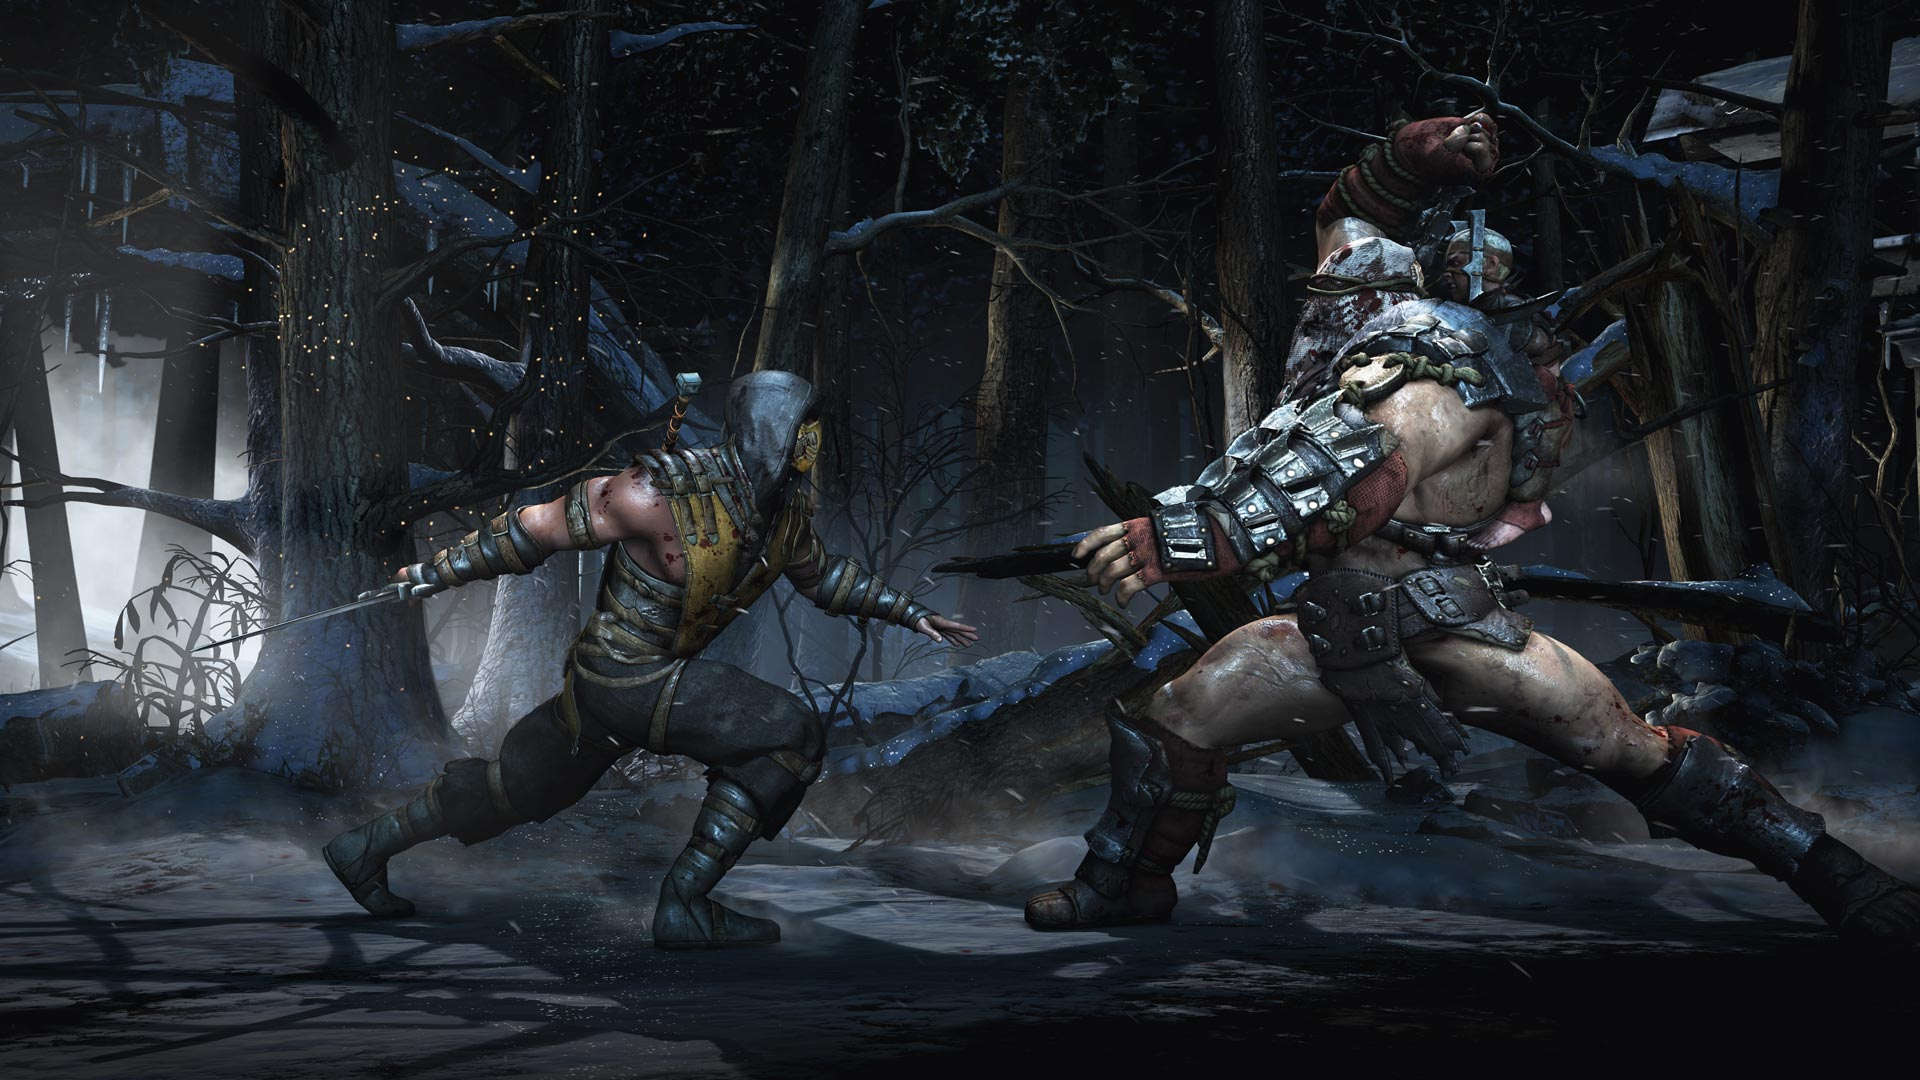 Mortal Kombat x online matchmaking